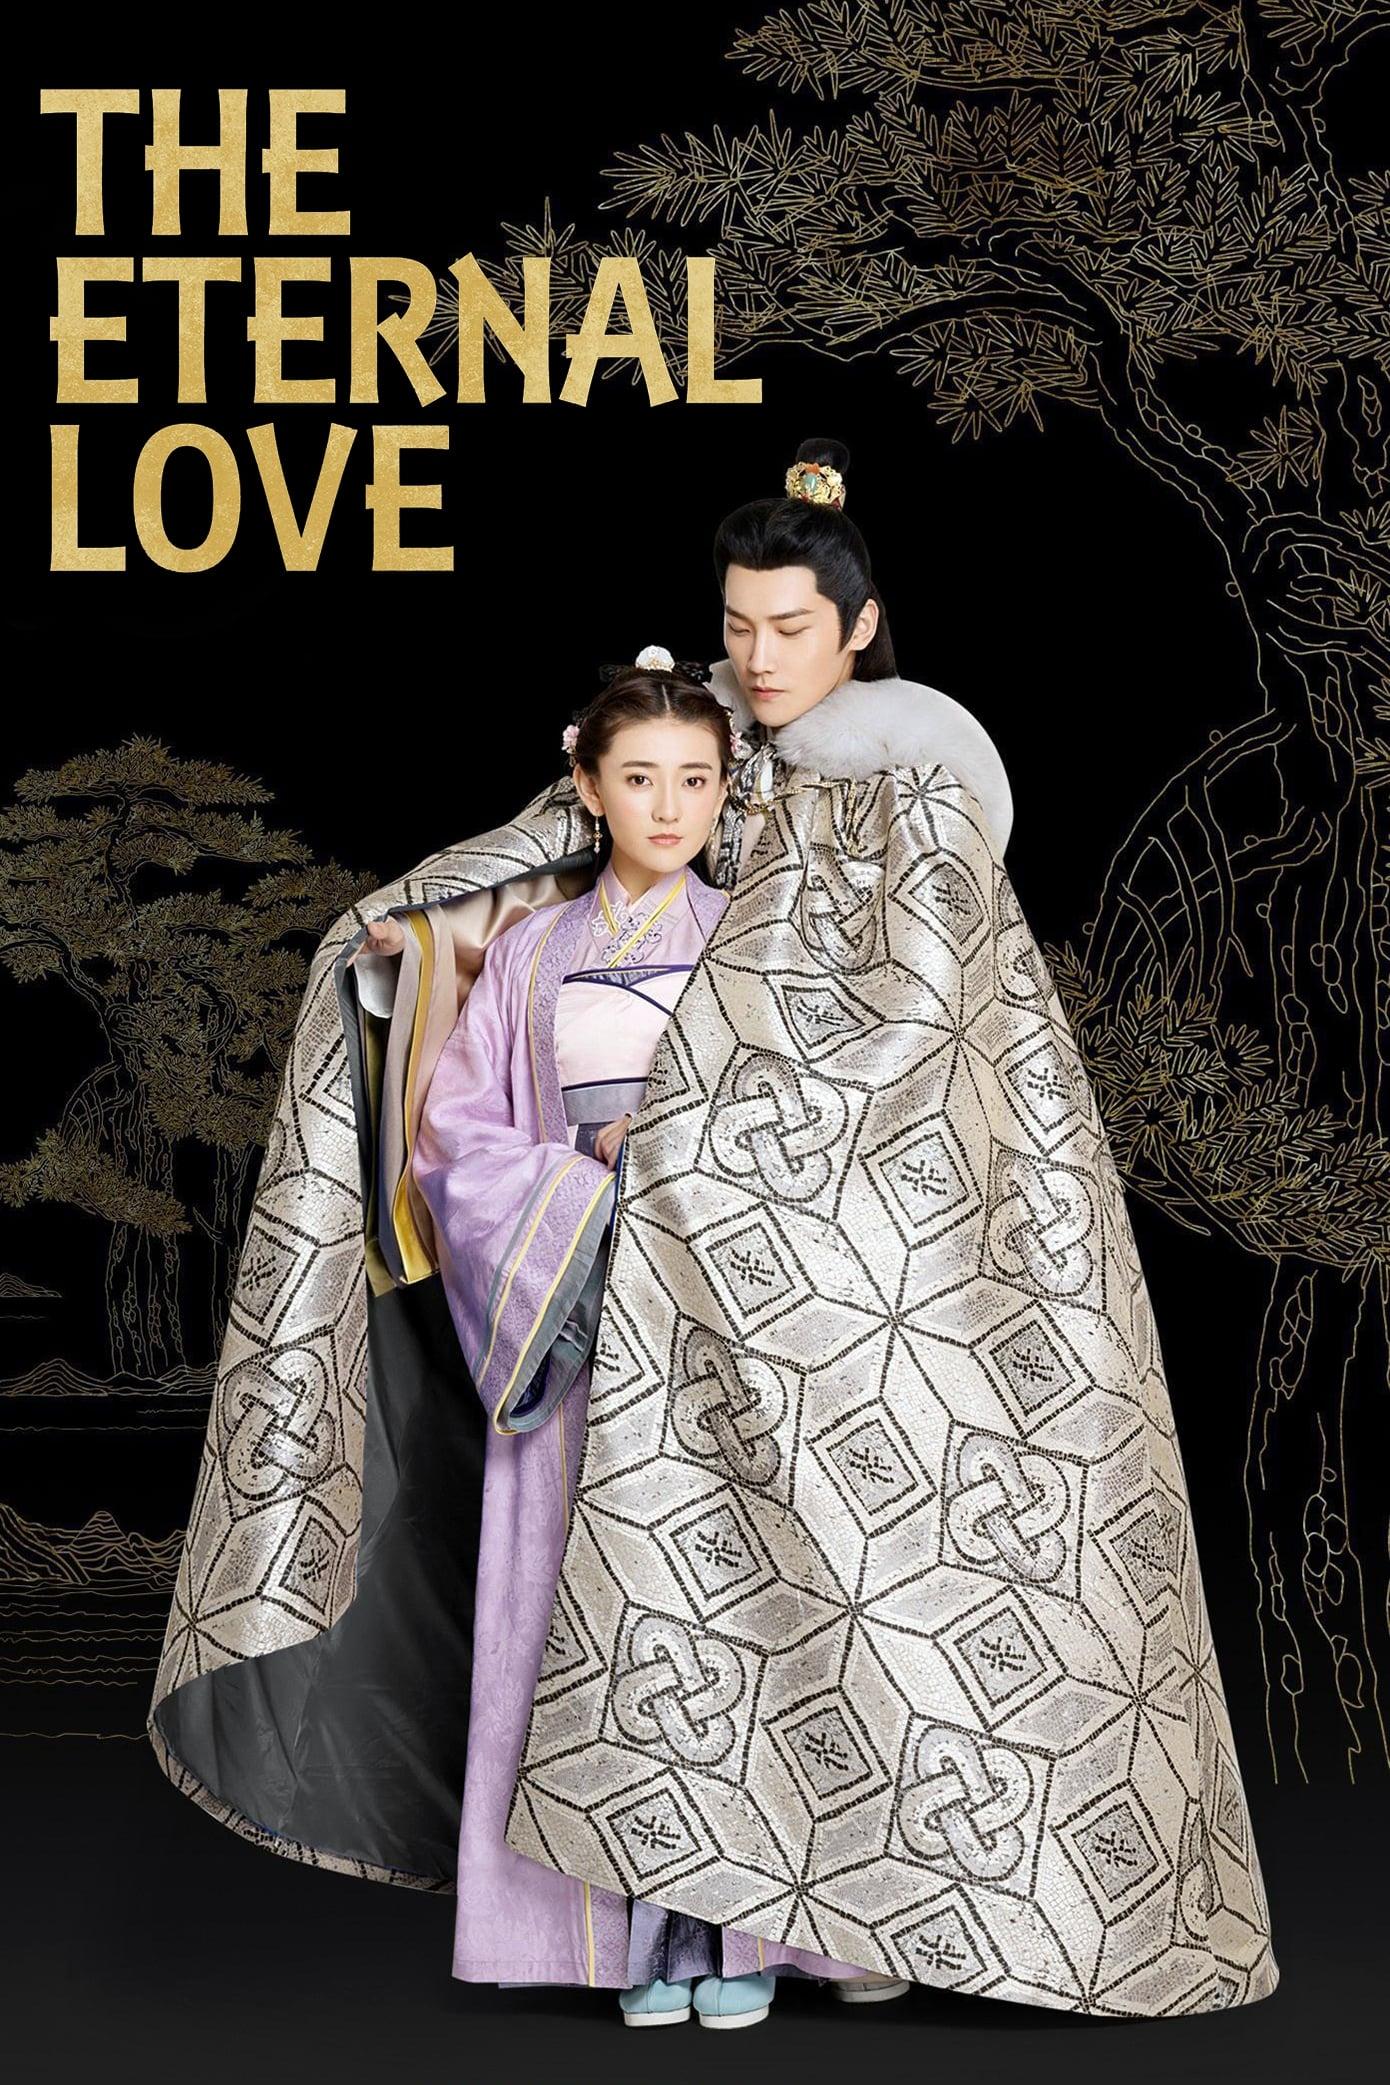 The Eternal Love